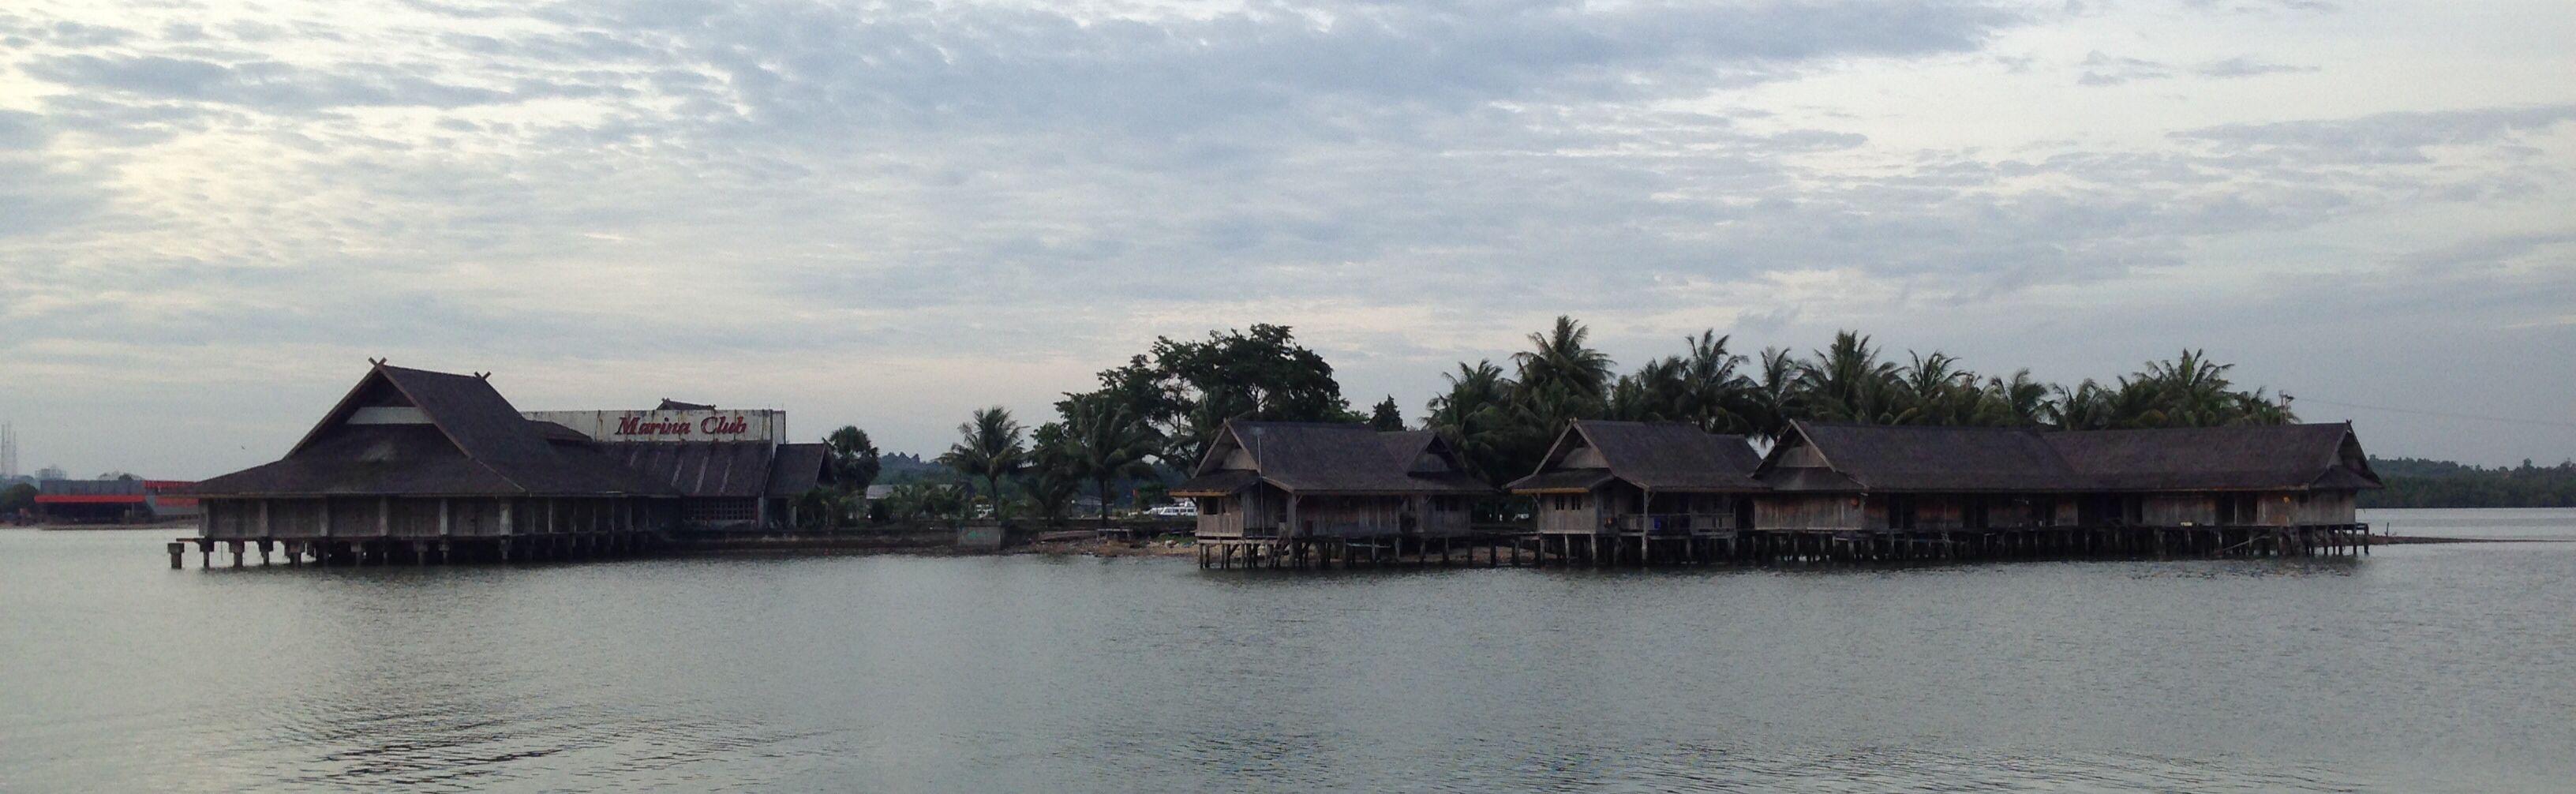 Hotel Laut Jaya Hotel Laut Jaya Tanjungpinang Tanjungpinang City Bintan Island